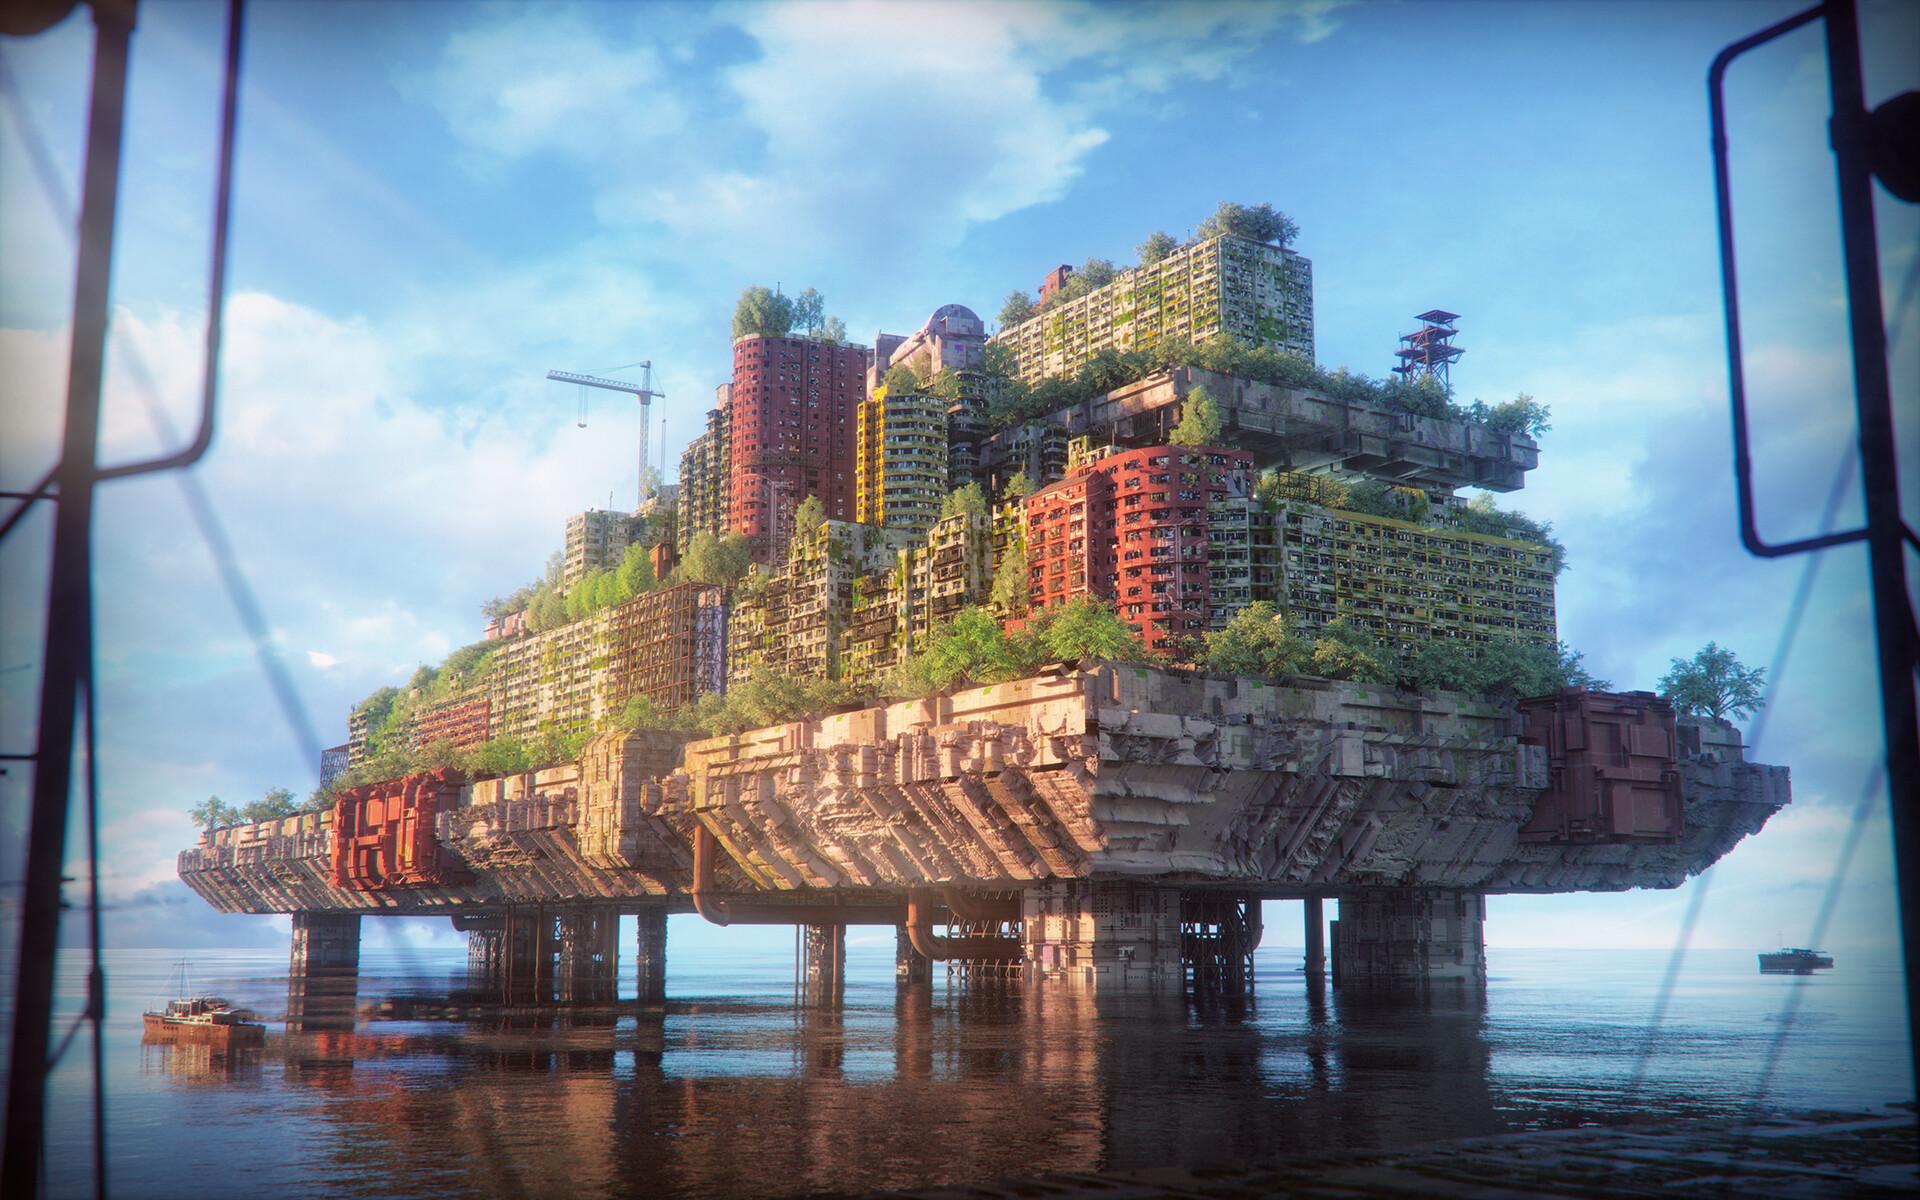 General 1920x1200 city overgrown Inward ArtStation building abandoned cranes (machine) sea